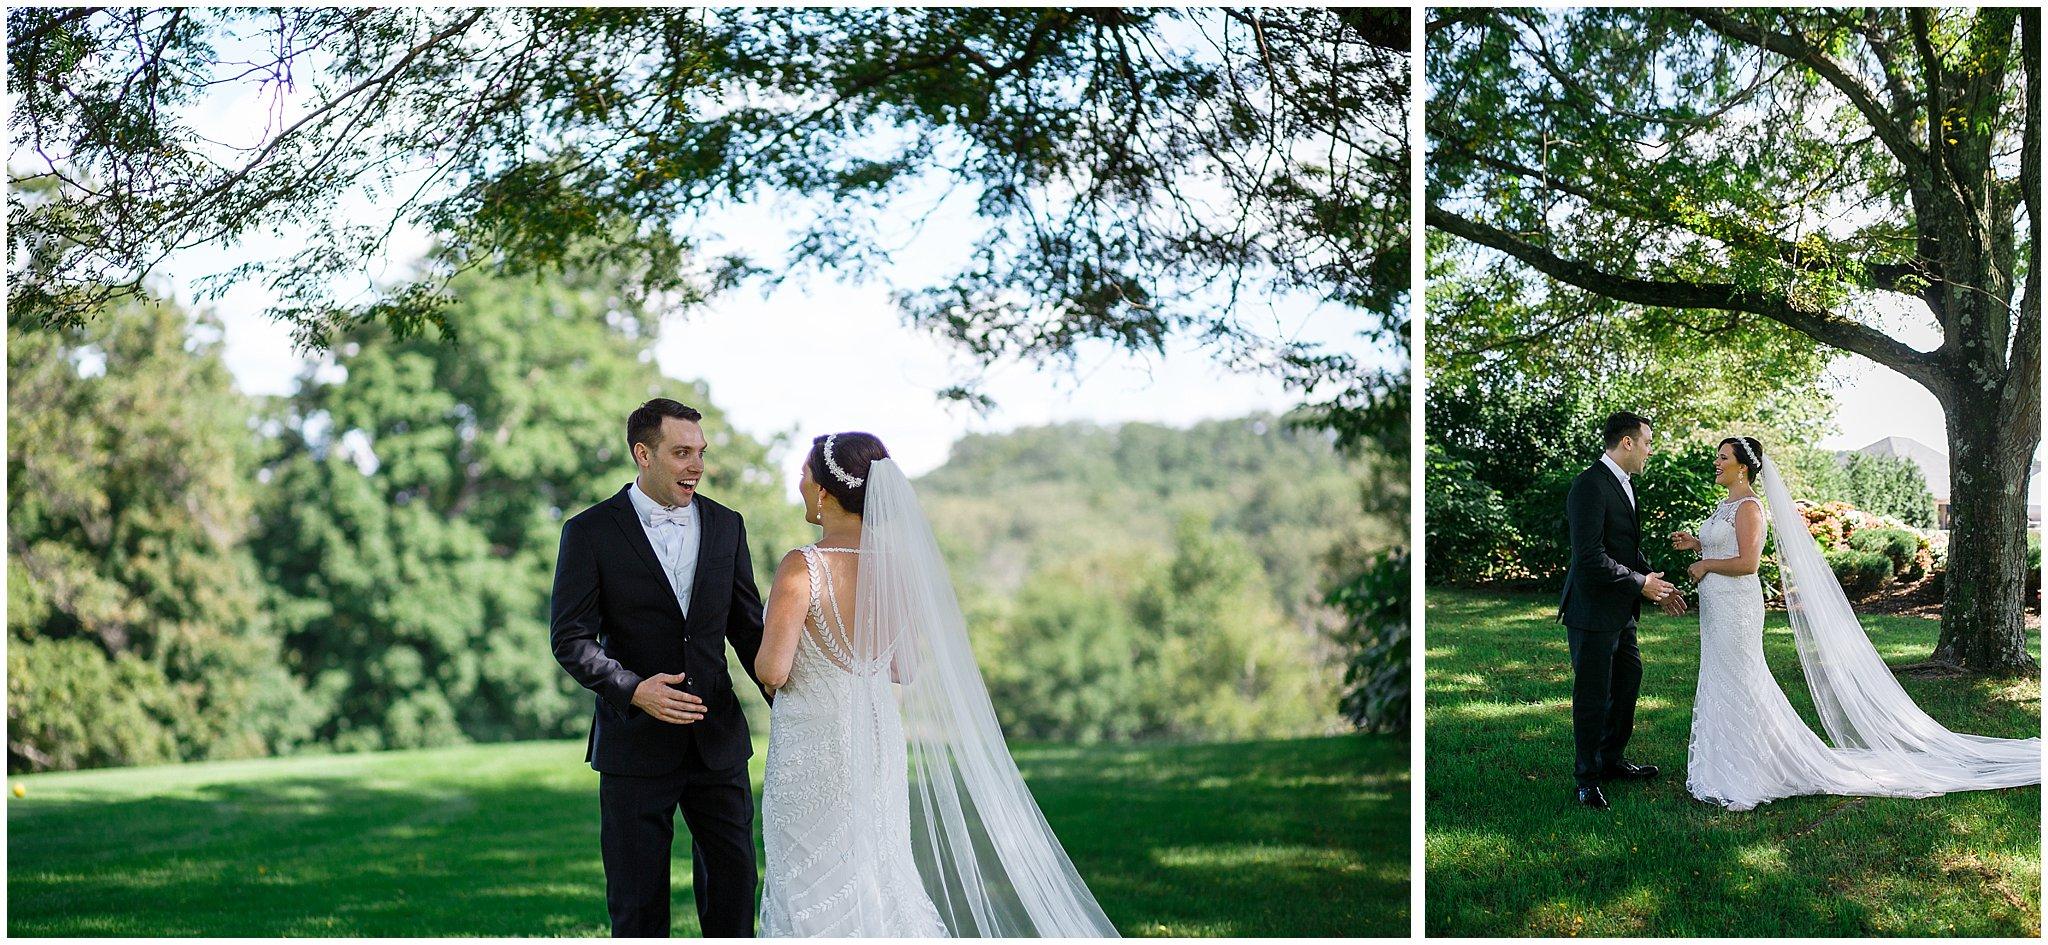 West Hills Country Club Wedding Gatsby Wedding Roaring Twenties Wedding Hudson Valley Wedding Photographer Sweet Alice Photography15.jpg